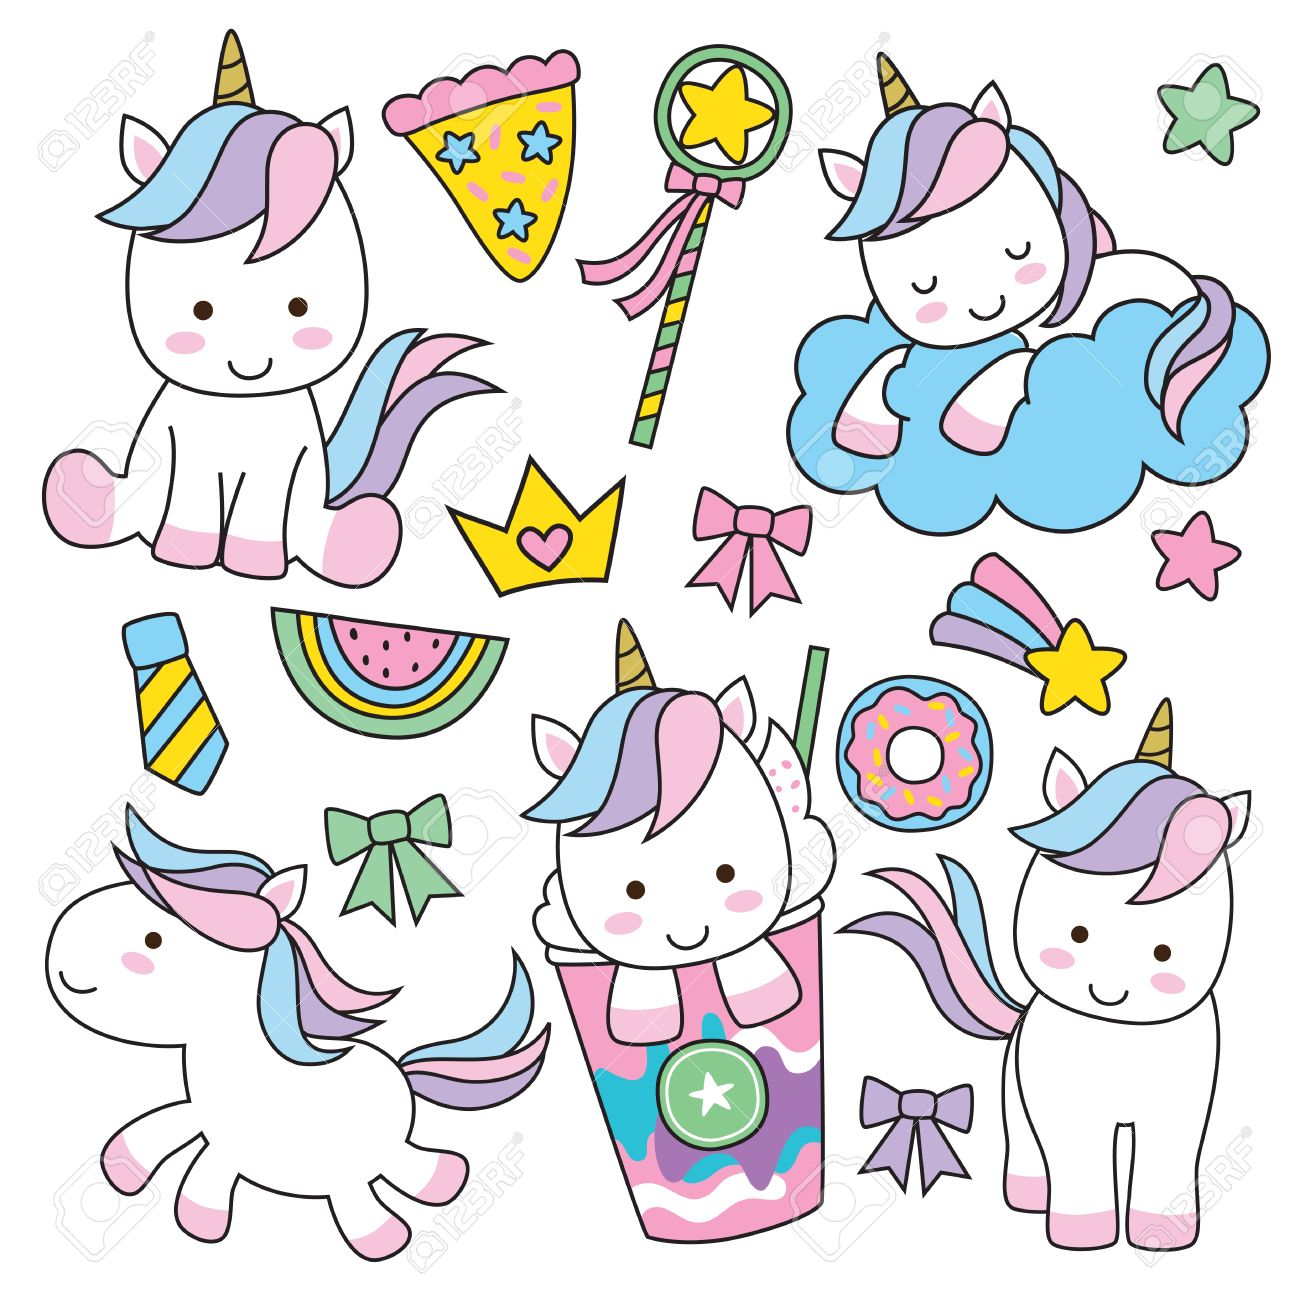 Cute Baby Unicorn Vector Illustration In Pastel Rainbow Colors Stock